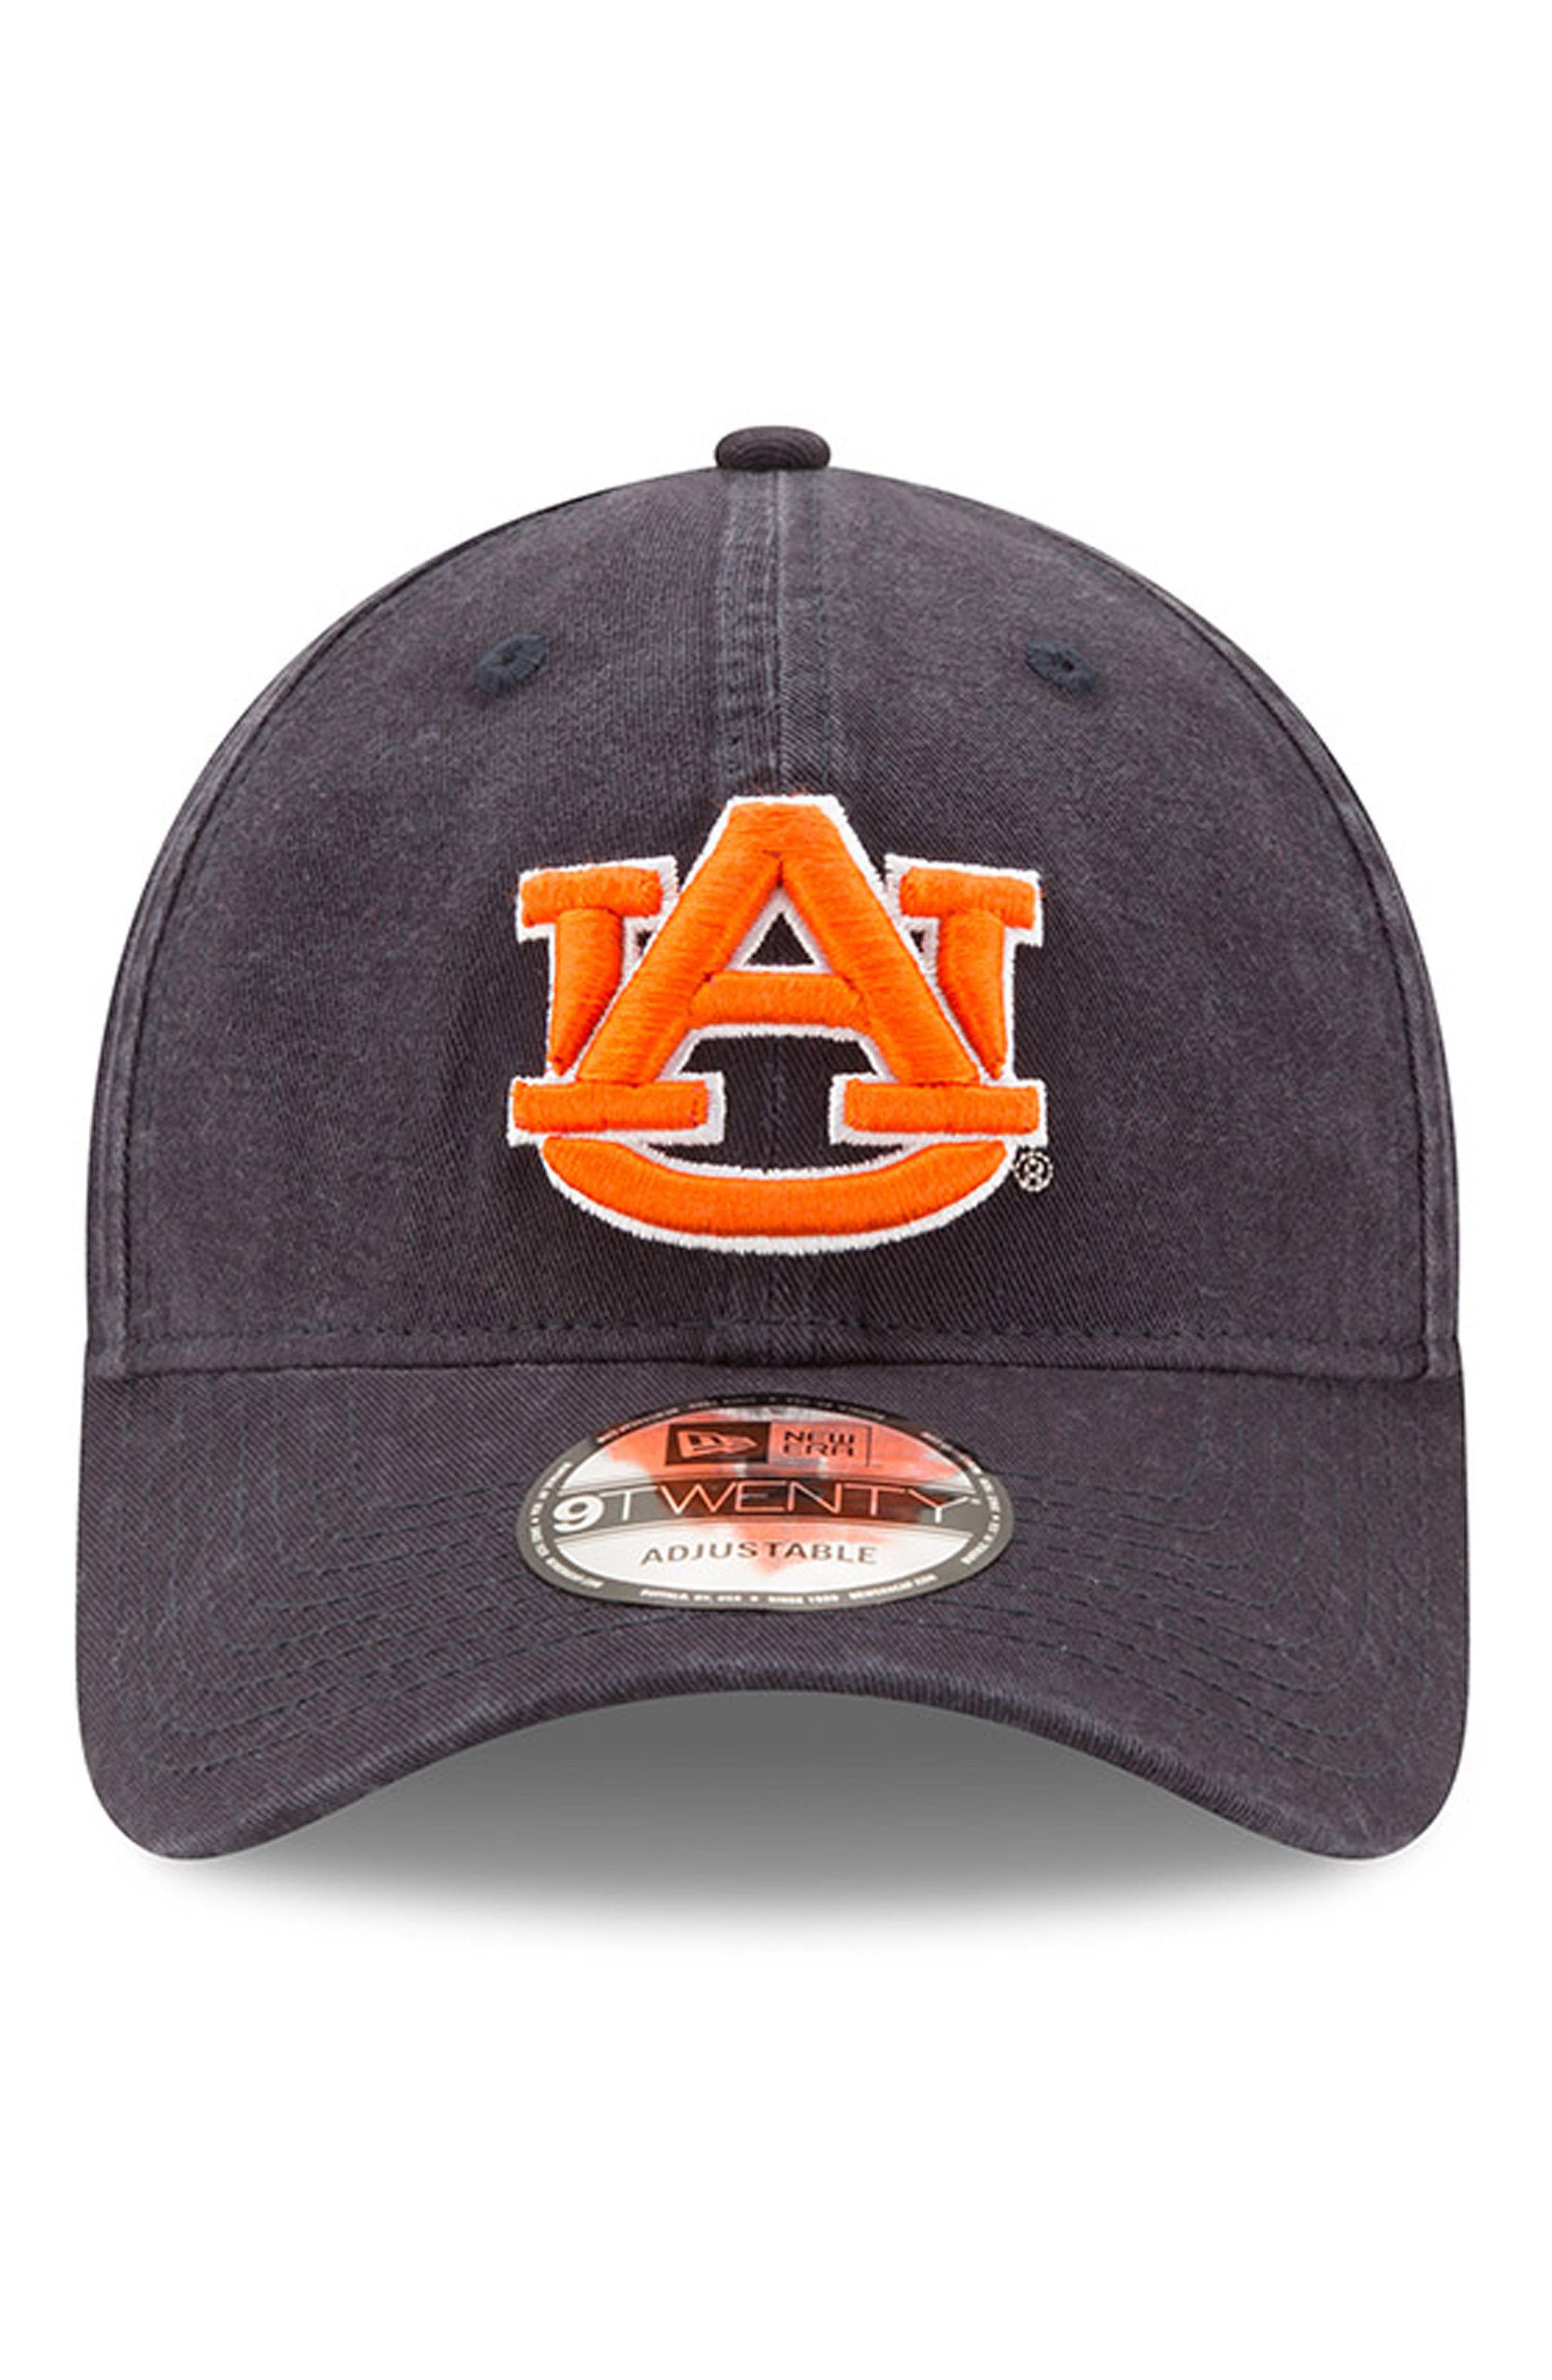 New Era Collegiate Core Classic - Auburn Tigers Baseball Cap,                             Alternate thumbnail 5, color,                             Auburn Tigers